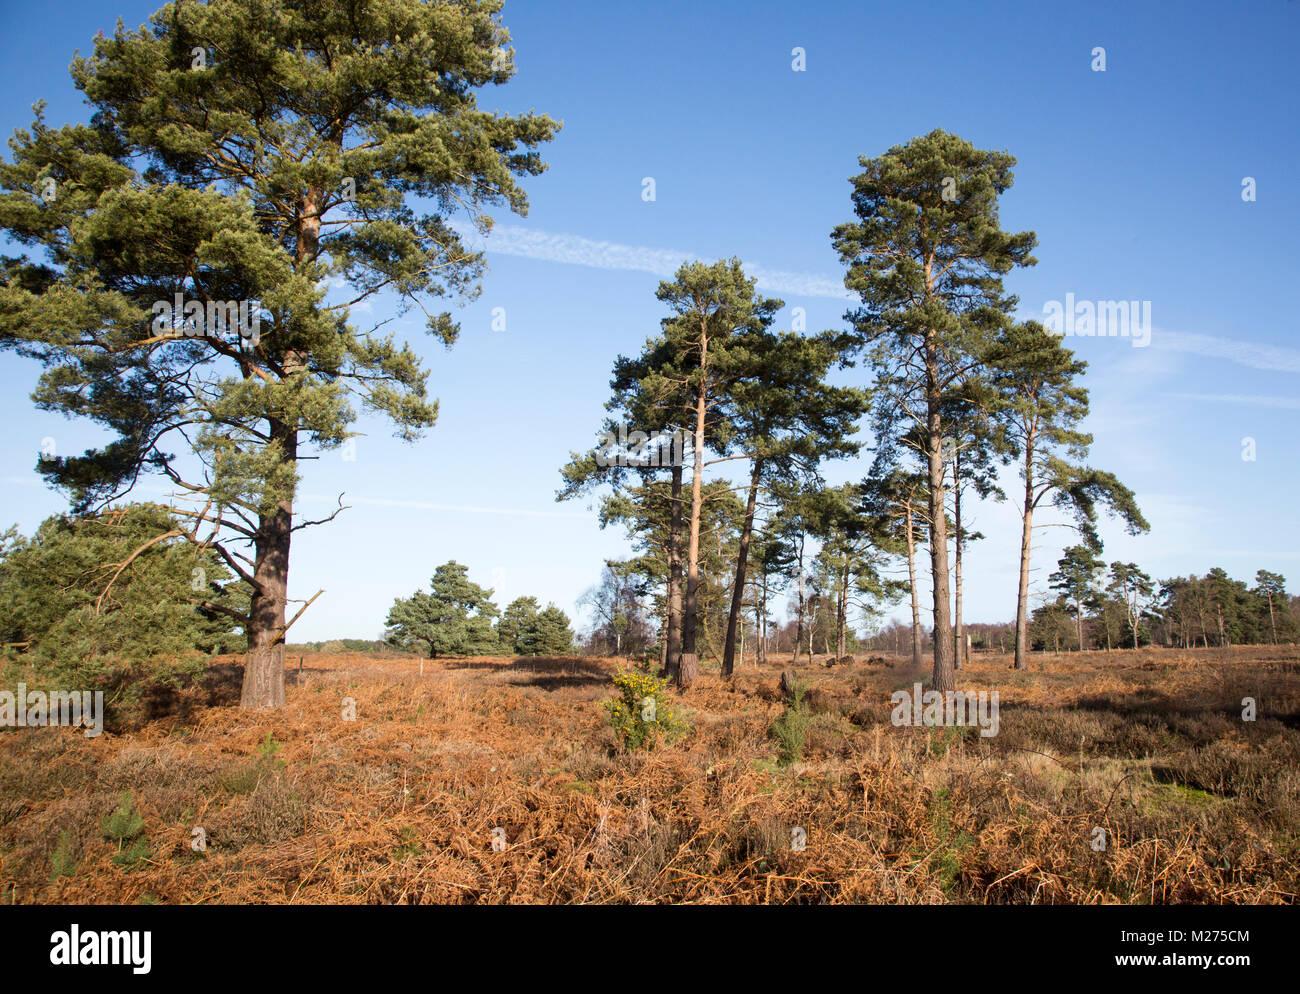 Heathland vegetation bracken, pine trees Upper Hollesley Common, Suffolk, England, UK - Stock Image